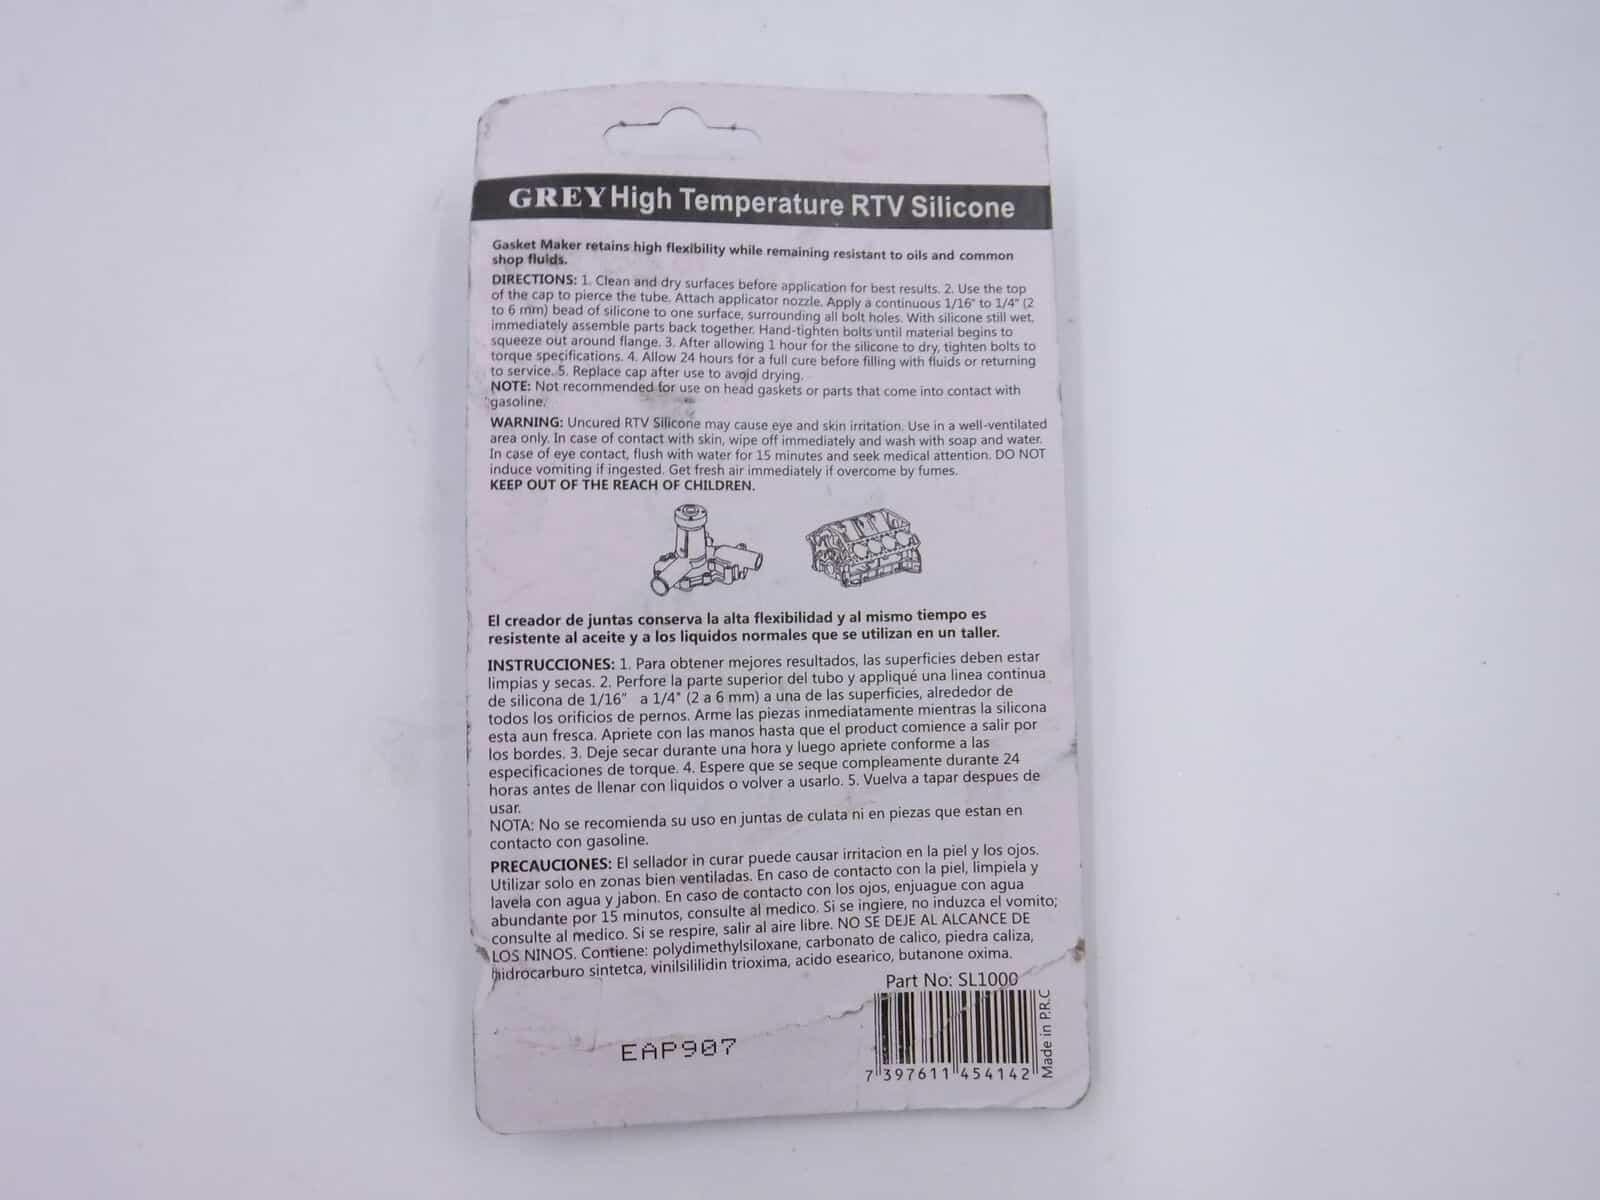 Evergreen High Temperature RTV Silicone Gasket Maker Grey SL1000 main-1 2